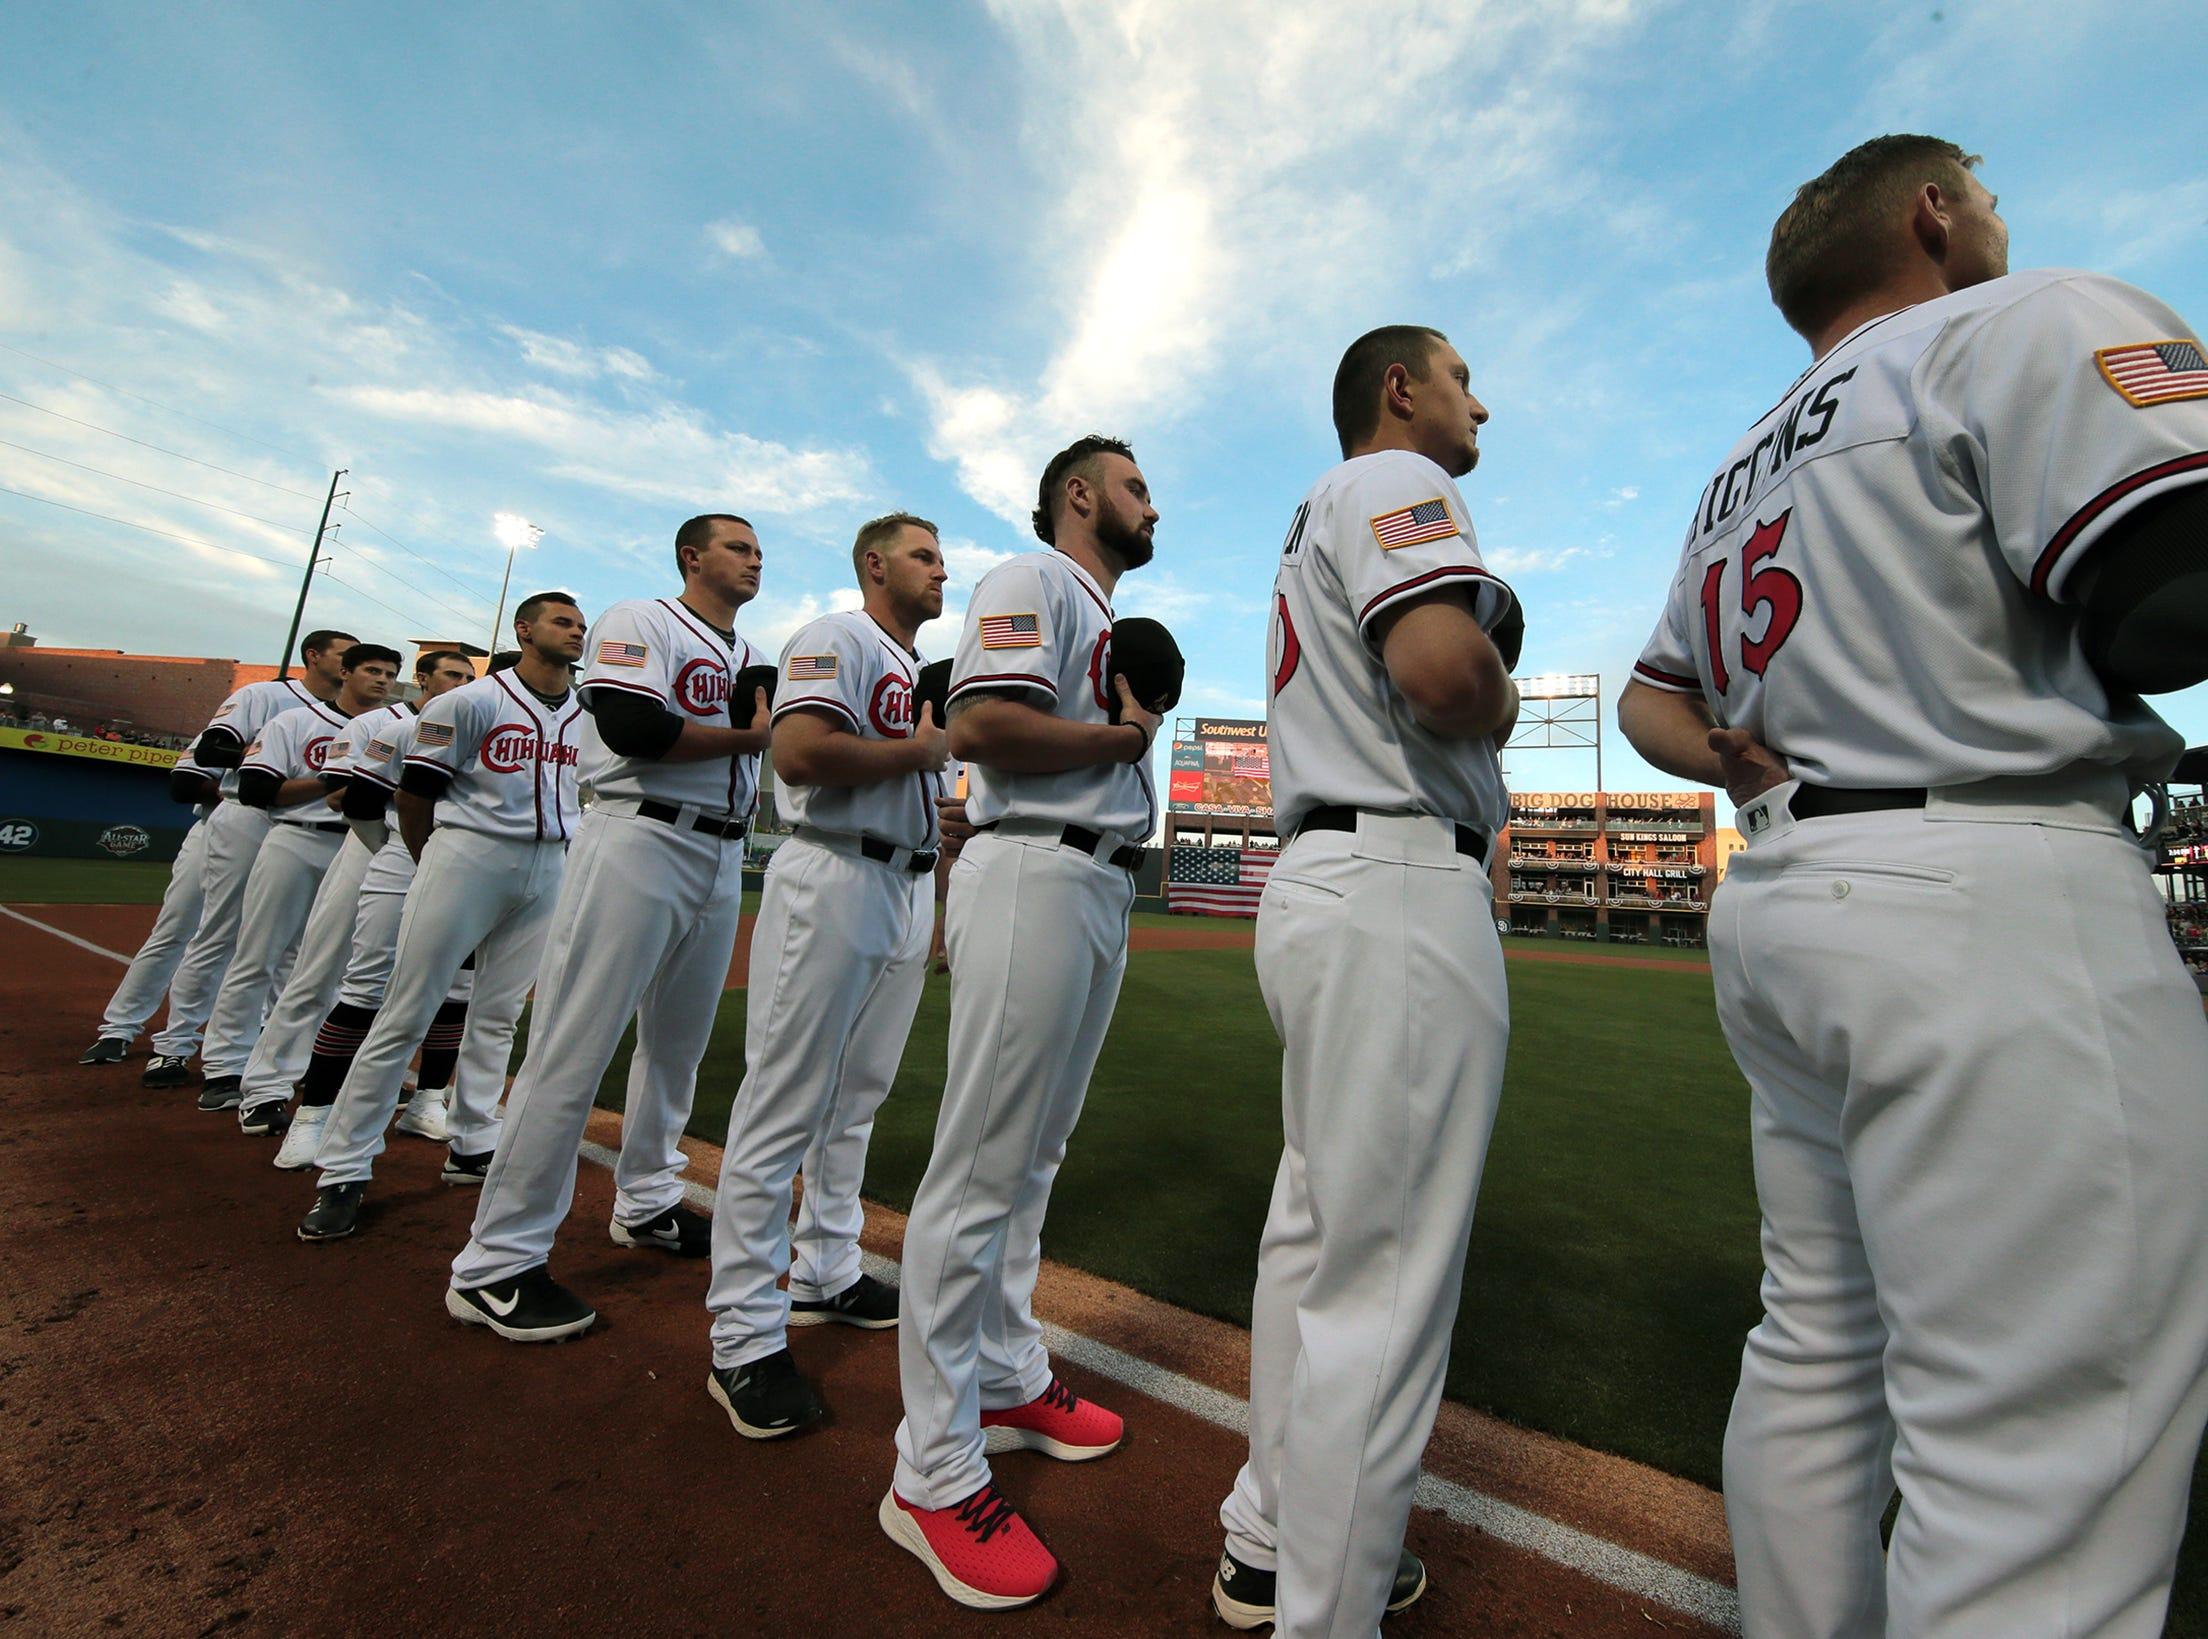 The El Paso Chihuahuas faced the Las Vegas Aviators on opening night Thursday at Southwest University Park.